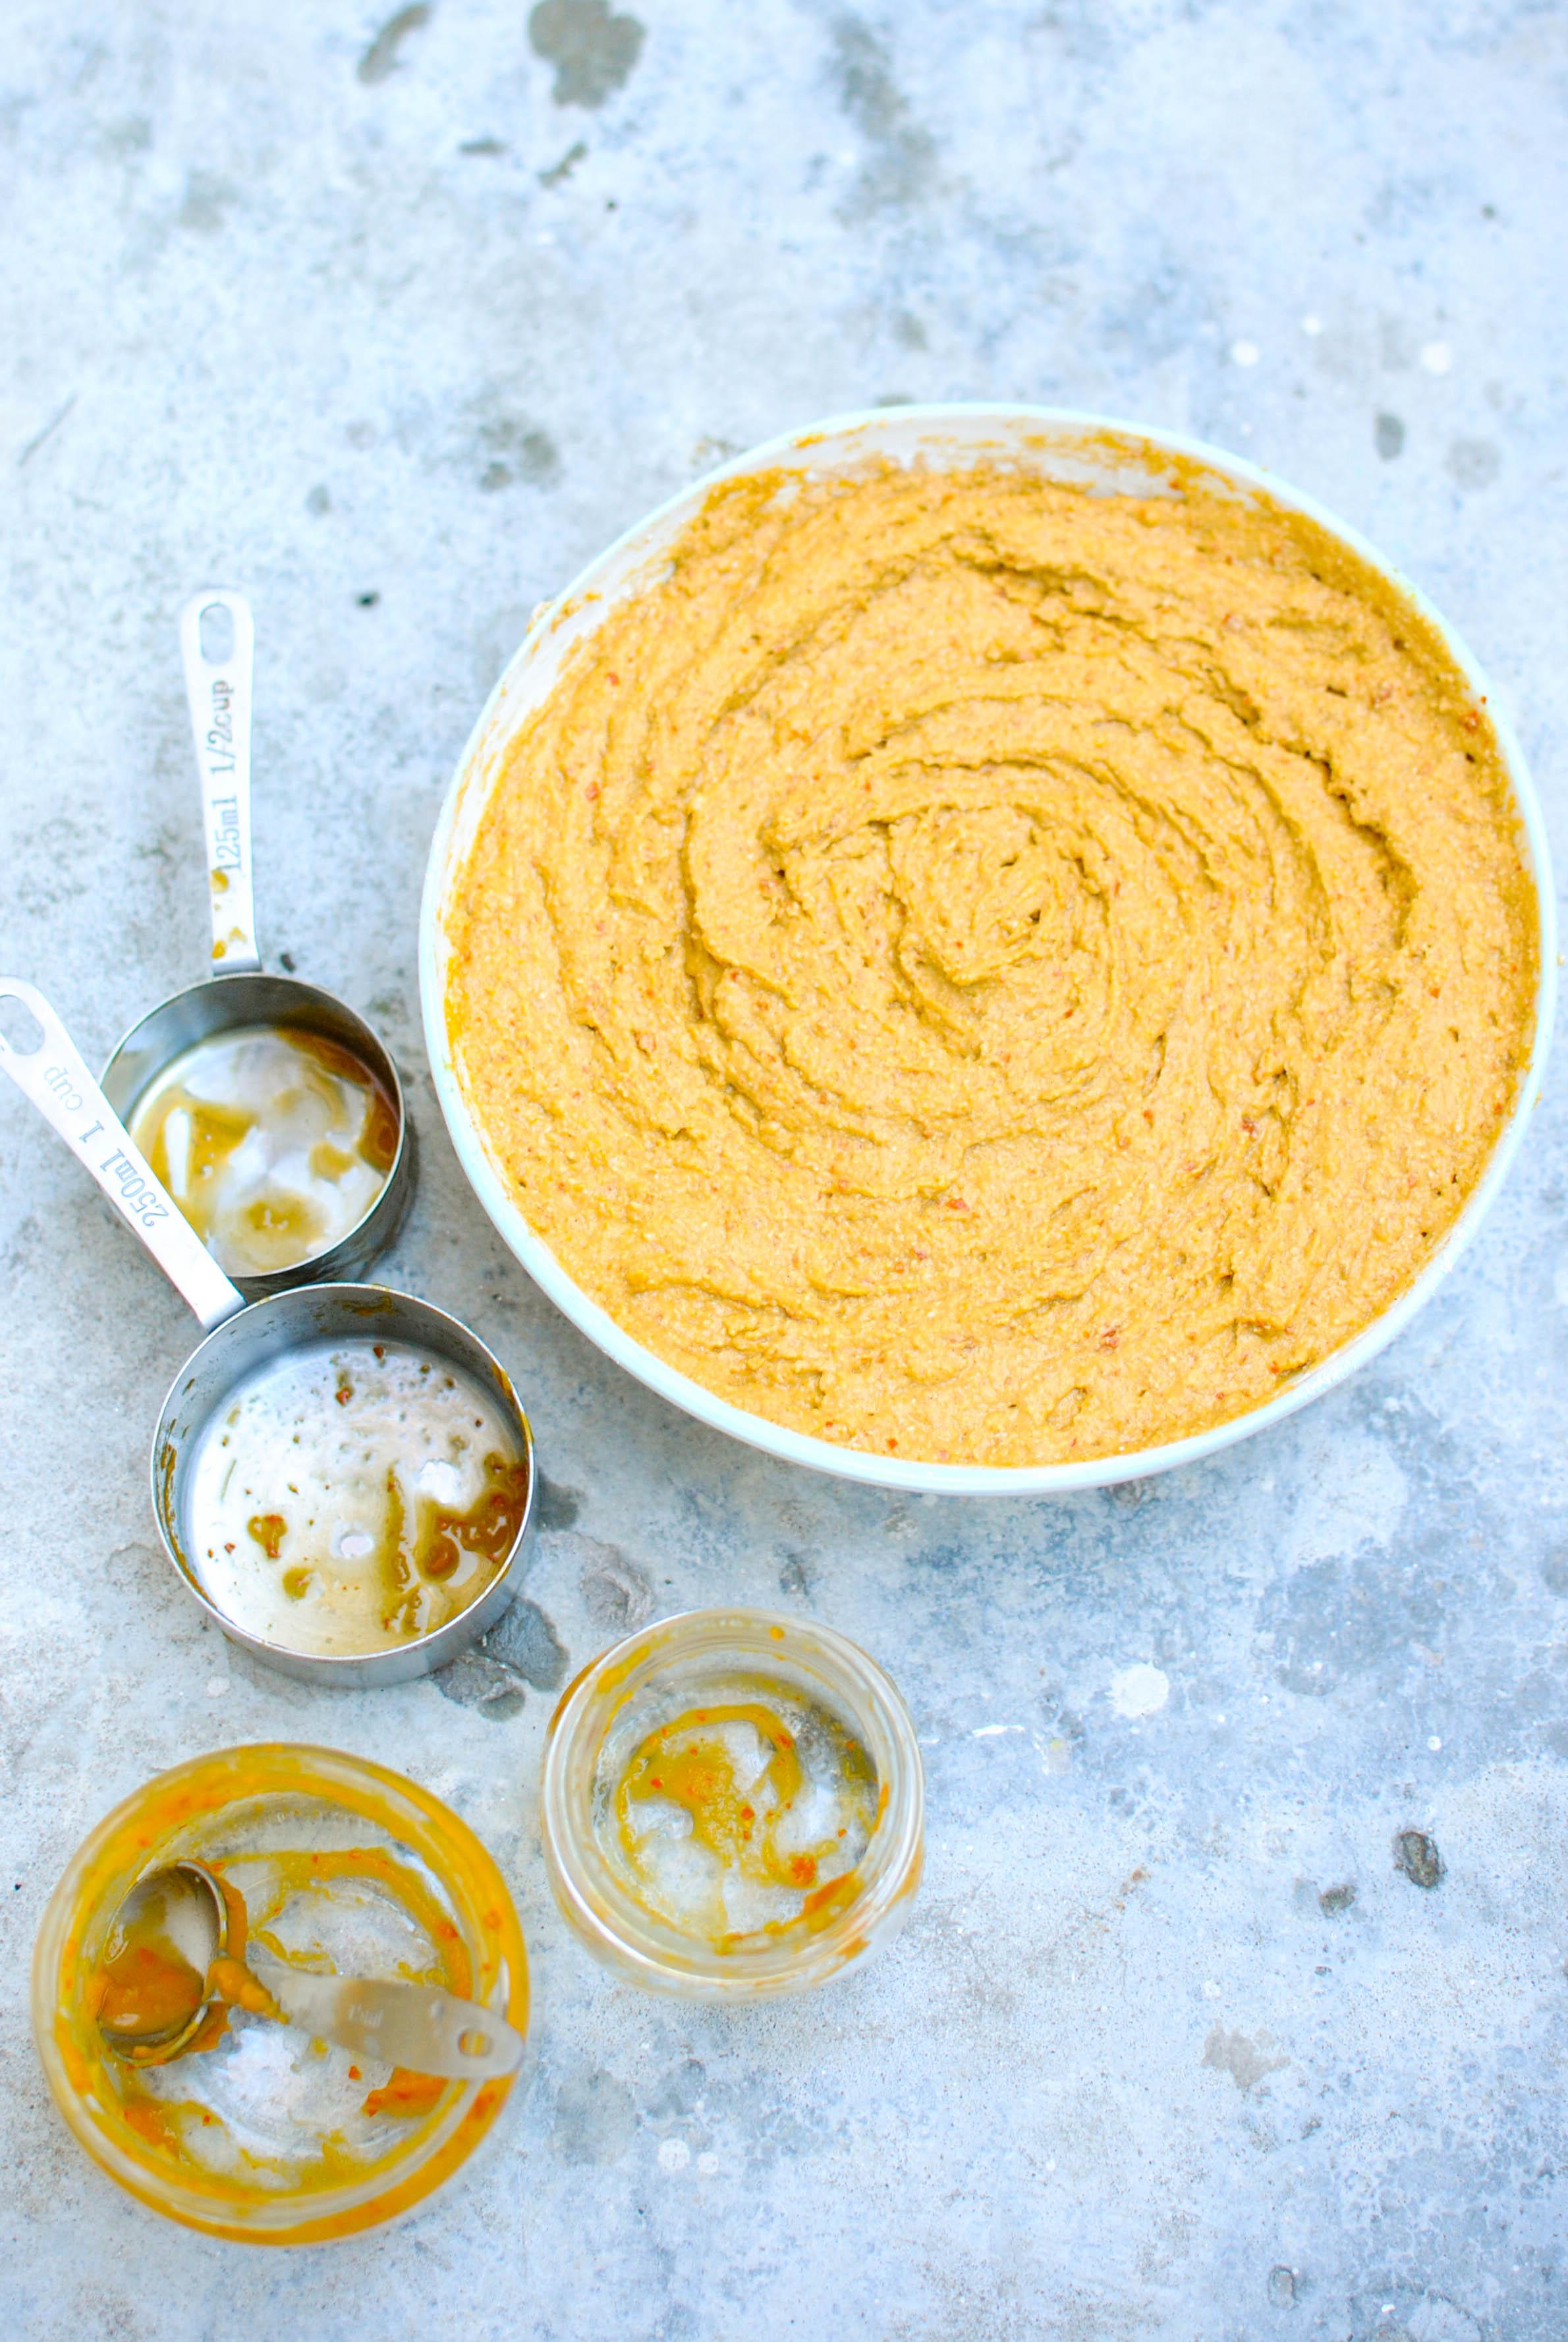 easy yummy pumpkin bread | please consider | joana limao